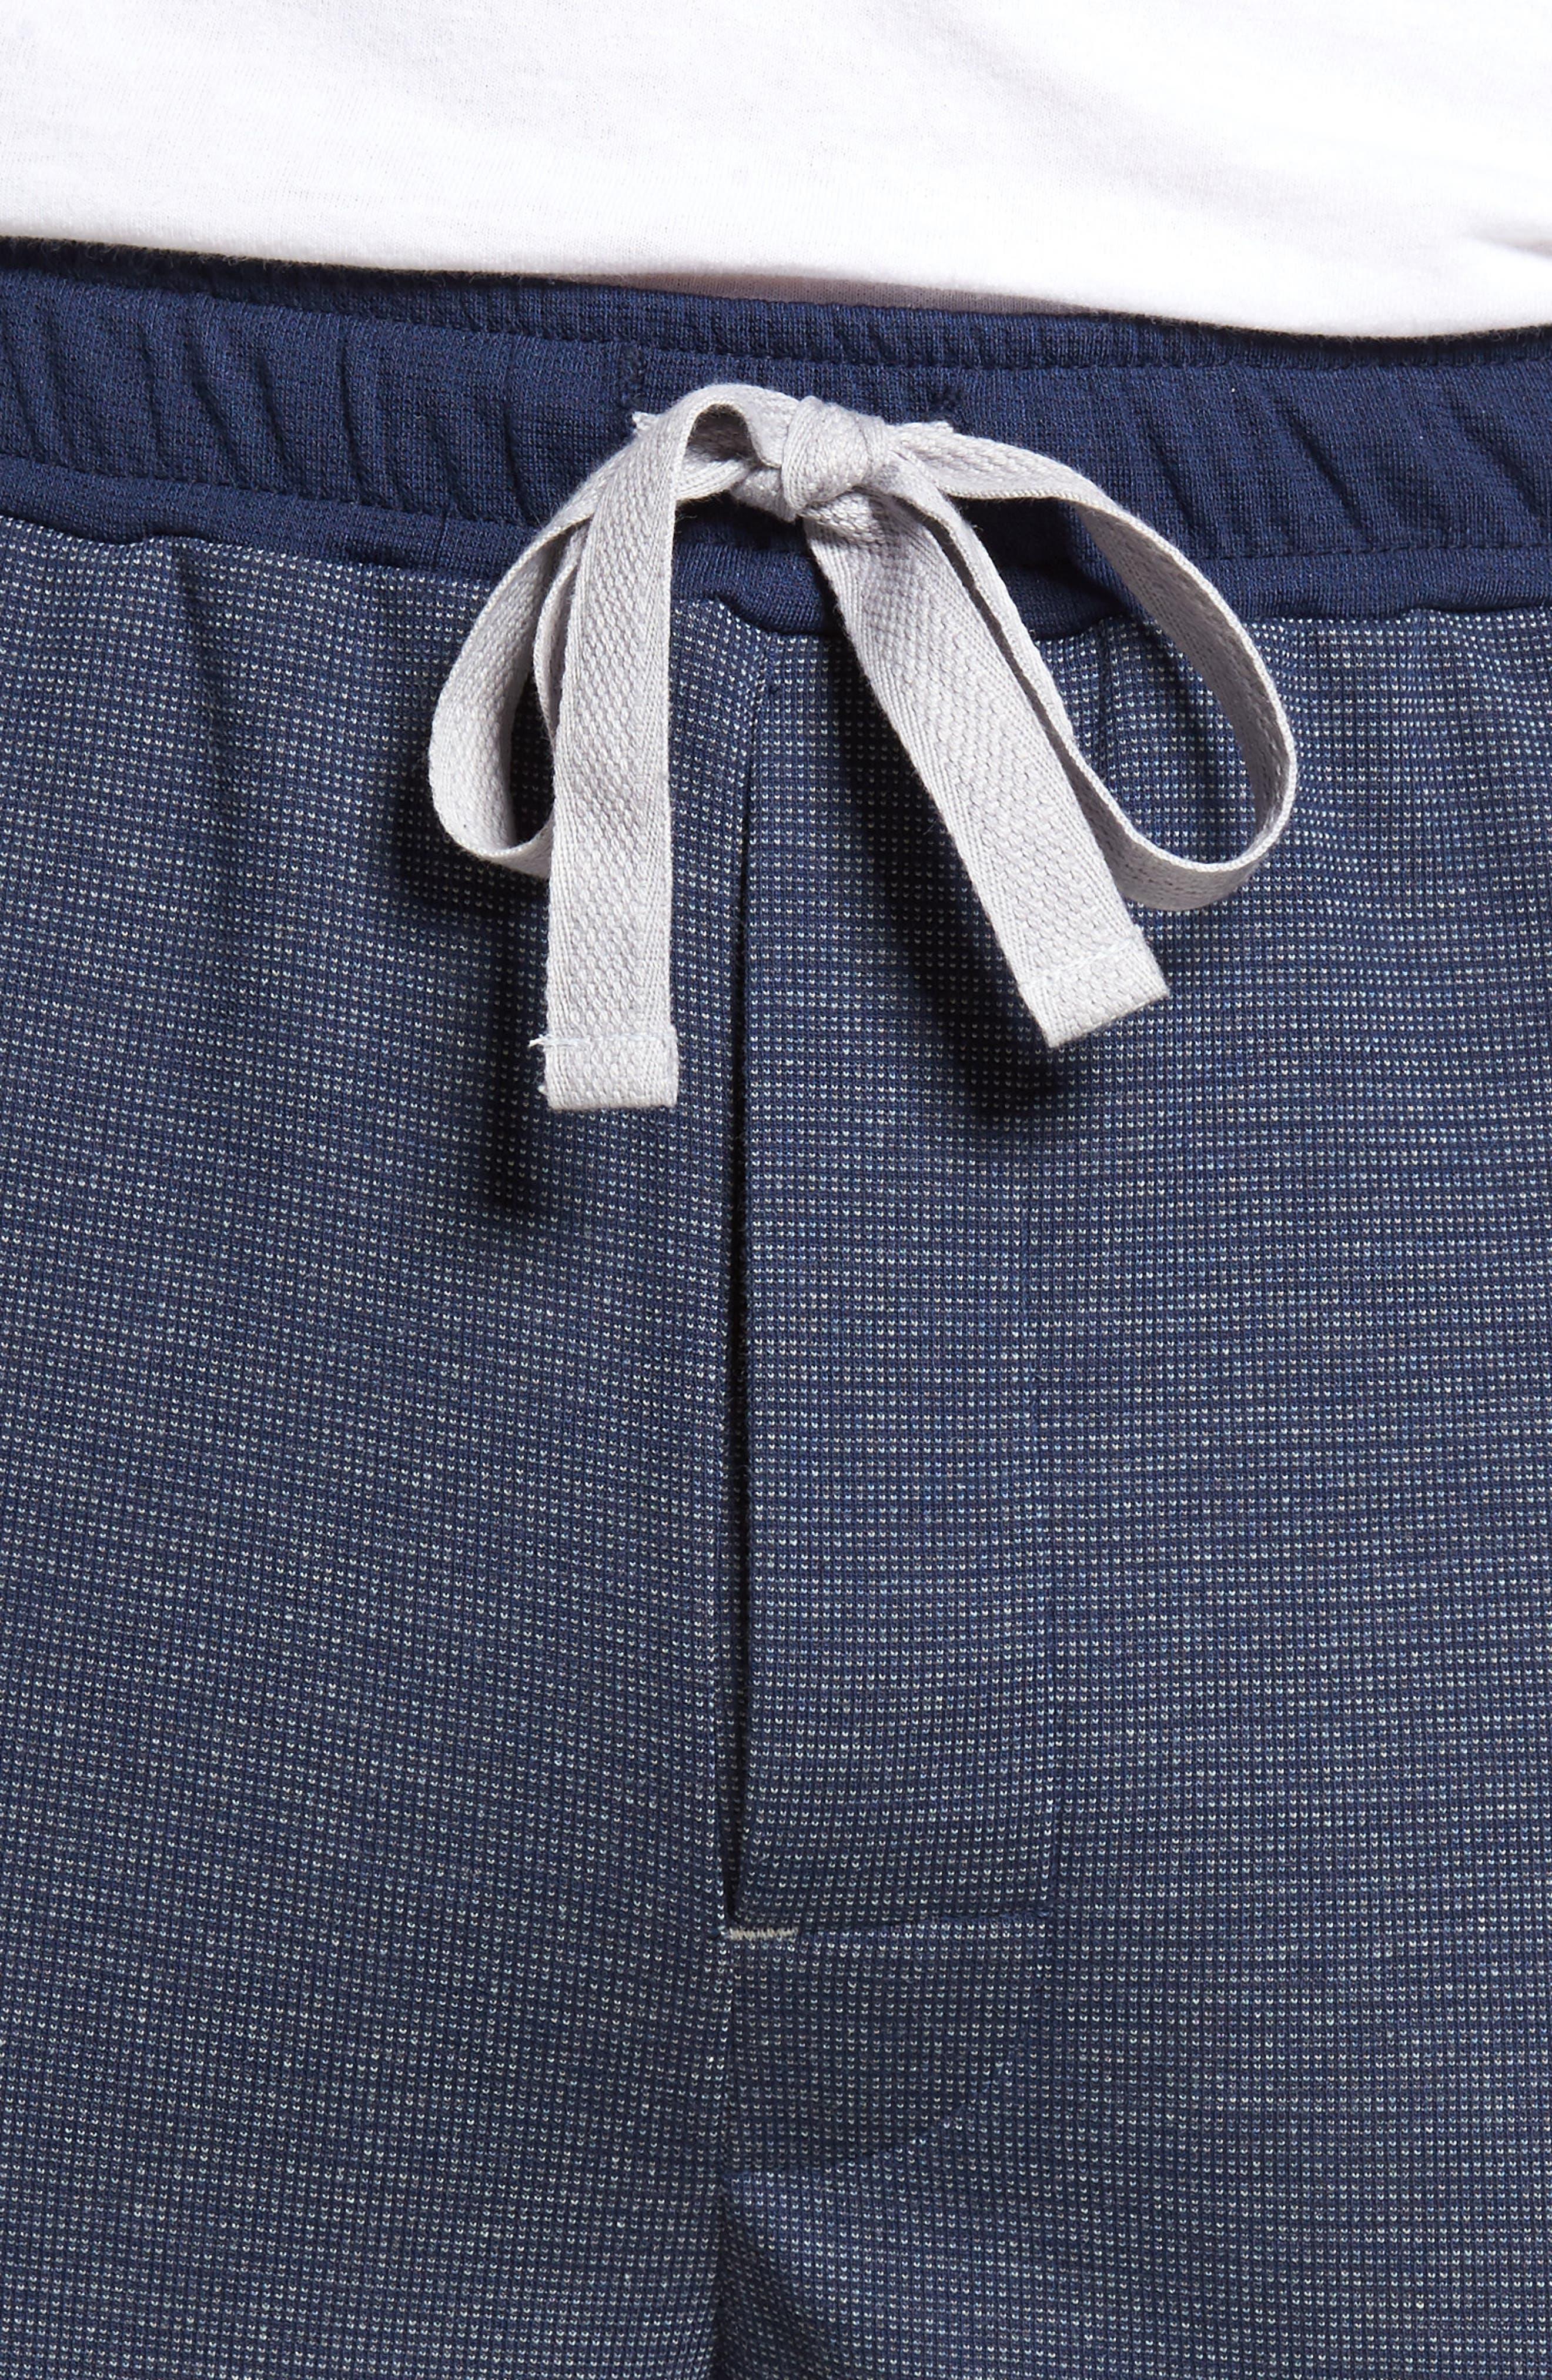 Lodge Layers Lounge Pants,                             Alternate thumbnail 5, color,                             410